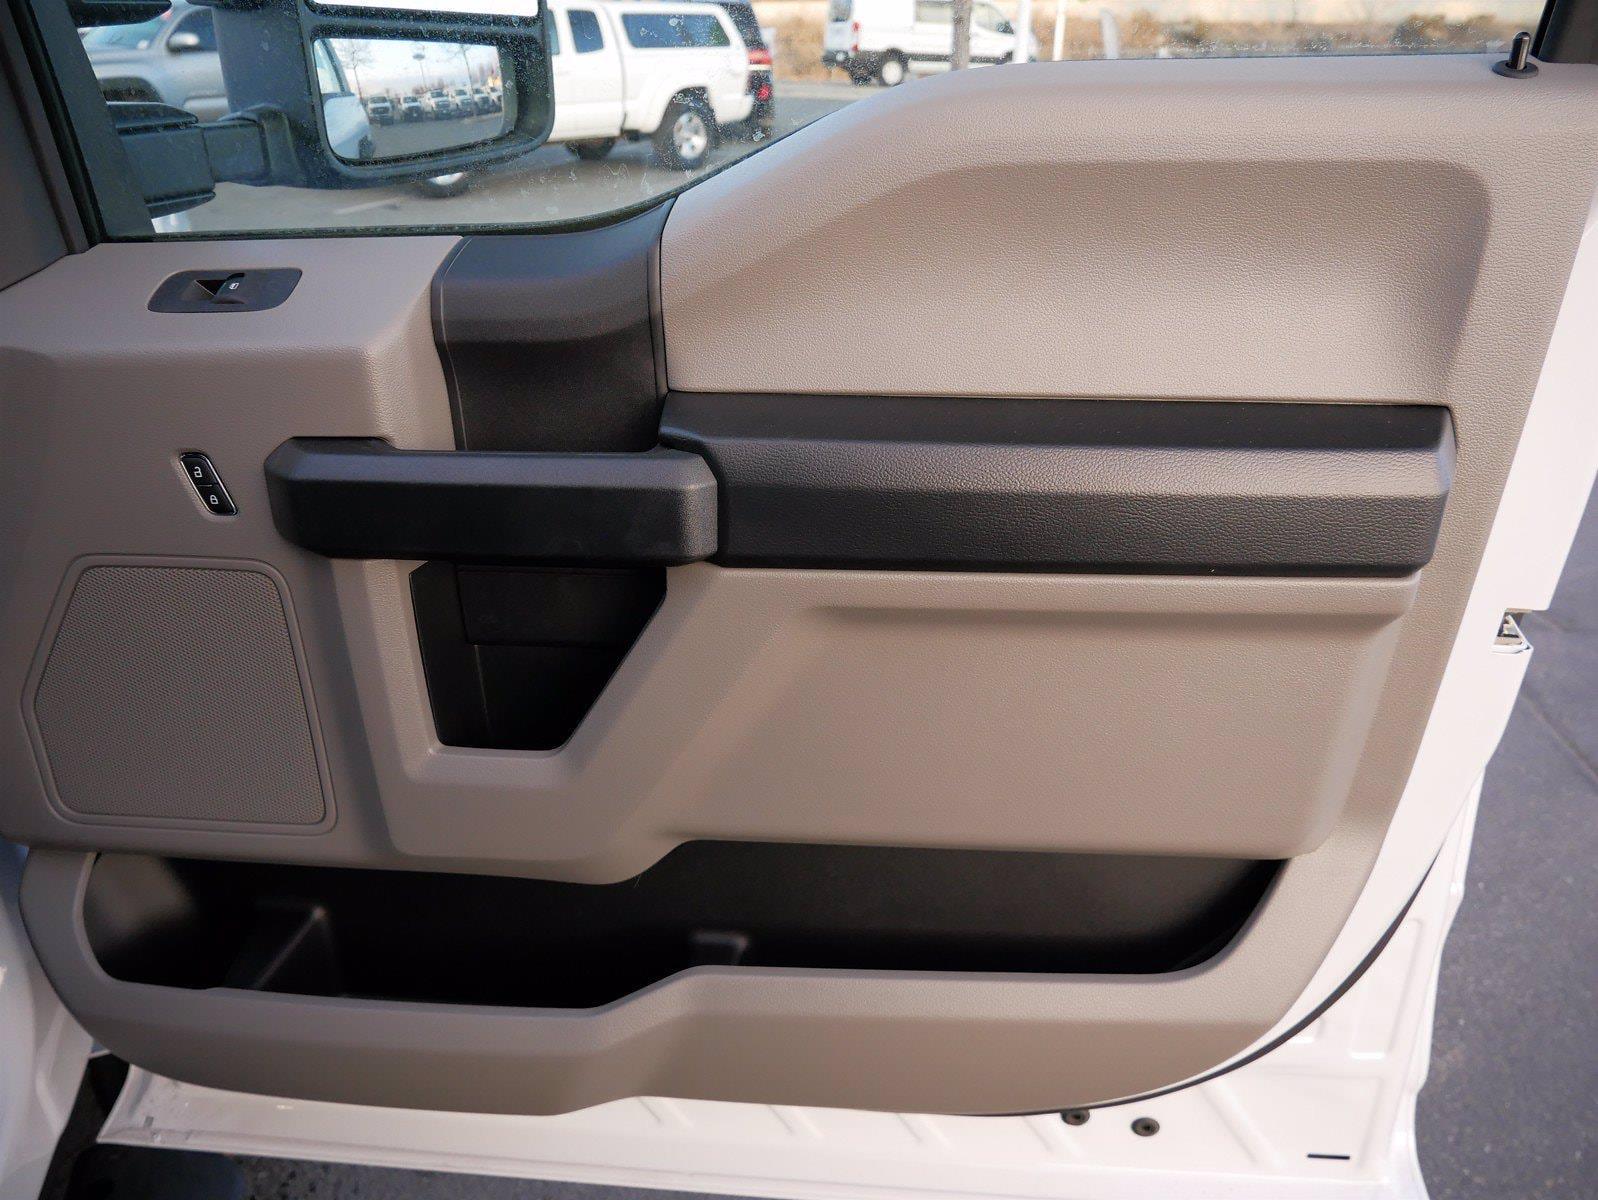 2021 Ford F-550 Regular Cab DRW 4x4, Scelzi Dump Body #64096 - photo 24